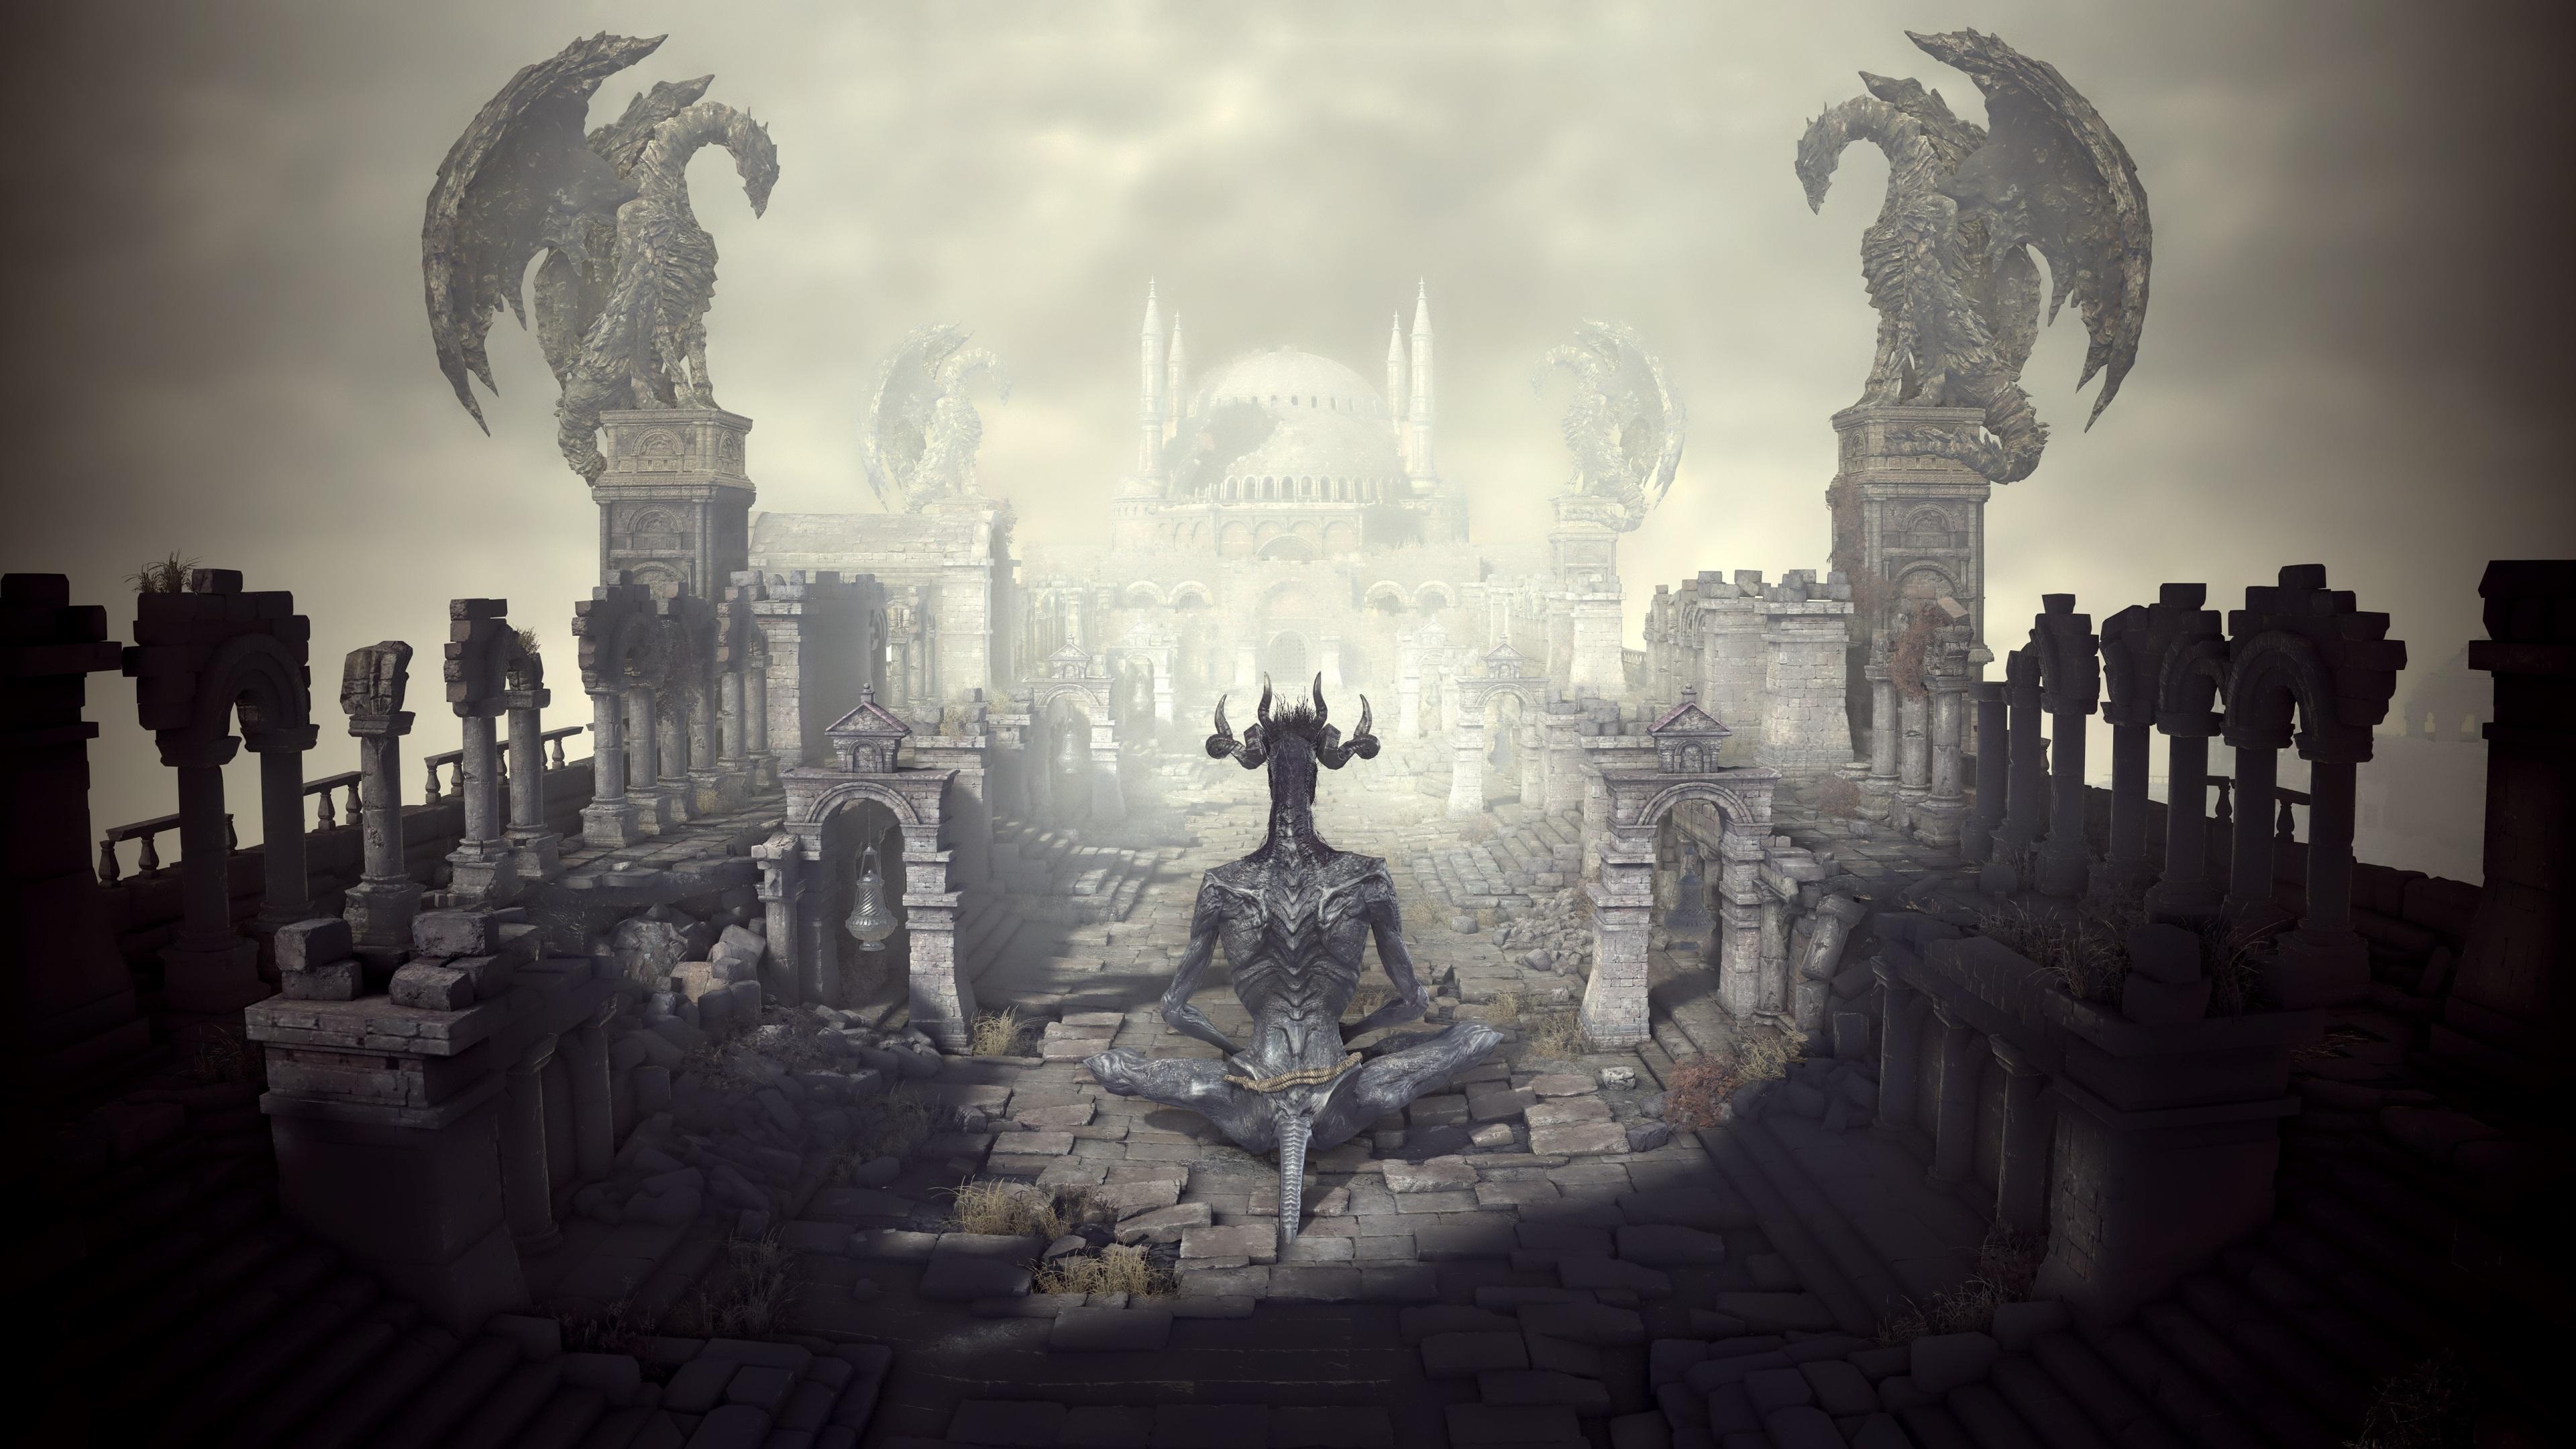 Dark Souls 3 Background 4k - HD Wallpaper